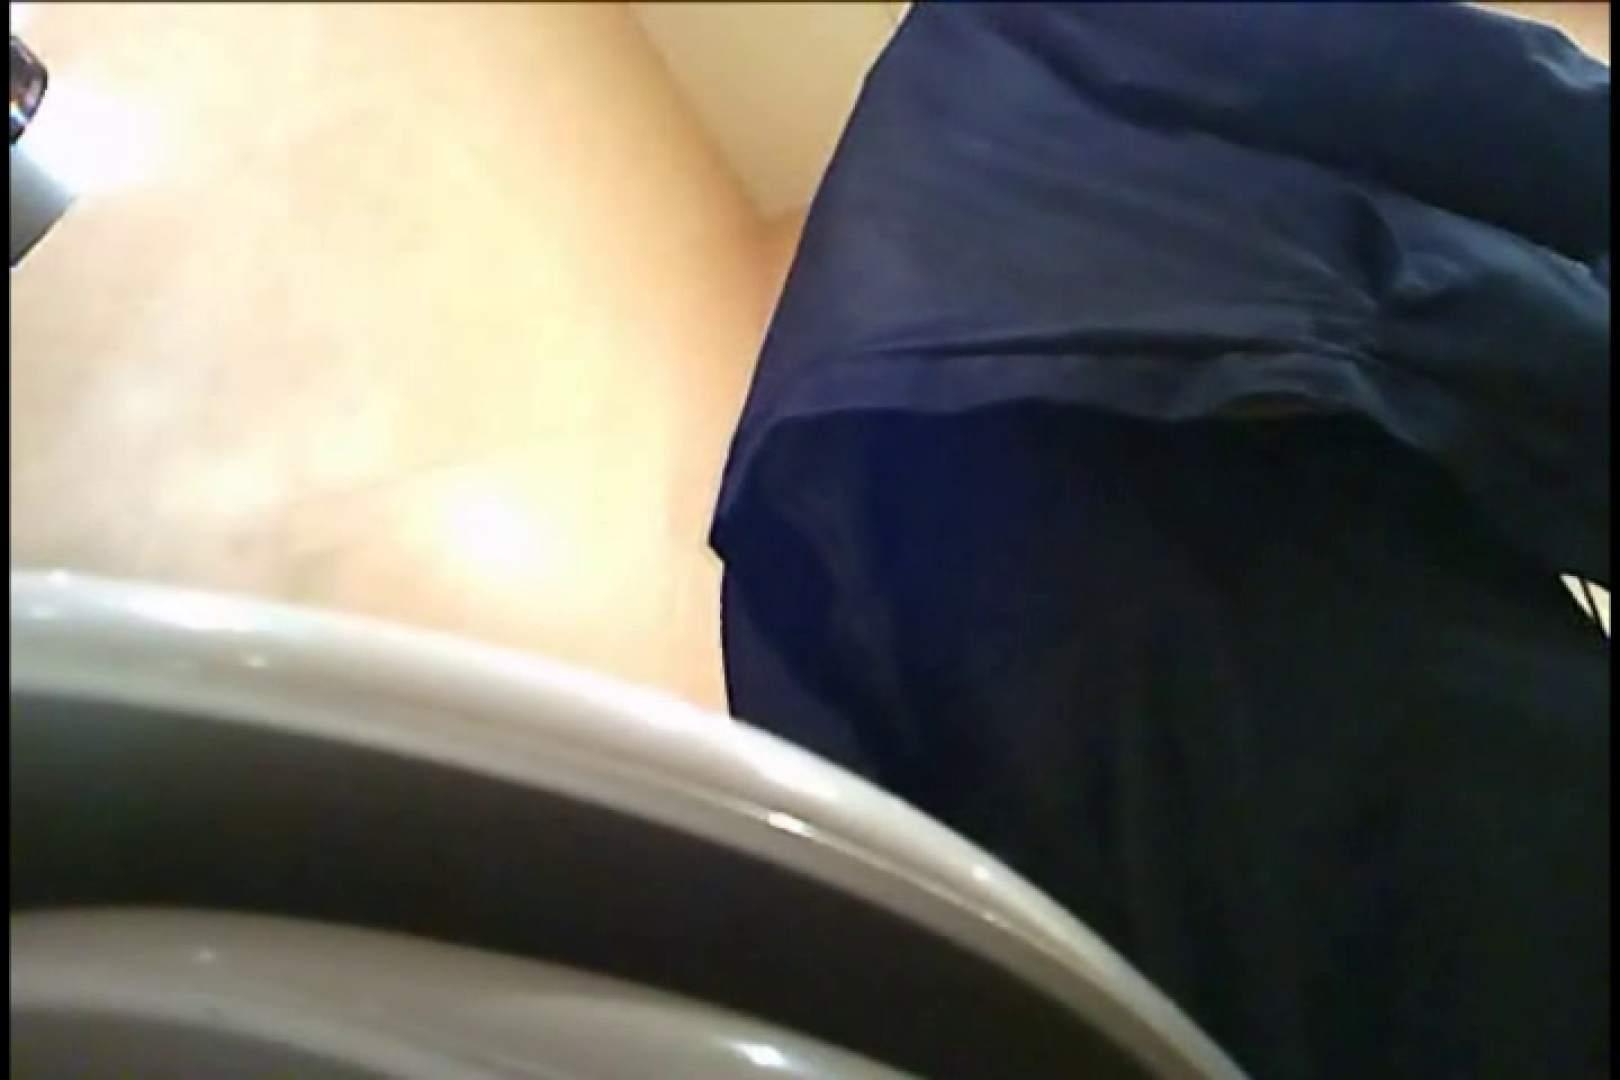 Gボーイ初投稿!掴み取りさんの洗面所覗き!in新幹線!VOL.06 イケメンのゲイ達 男同士動画 101枚 40